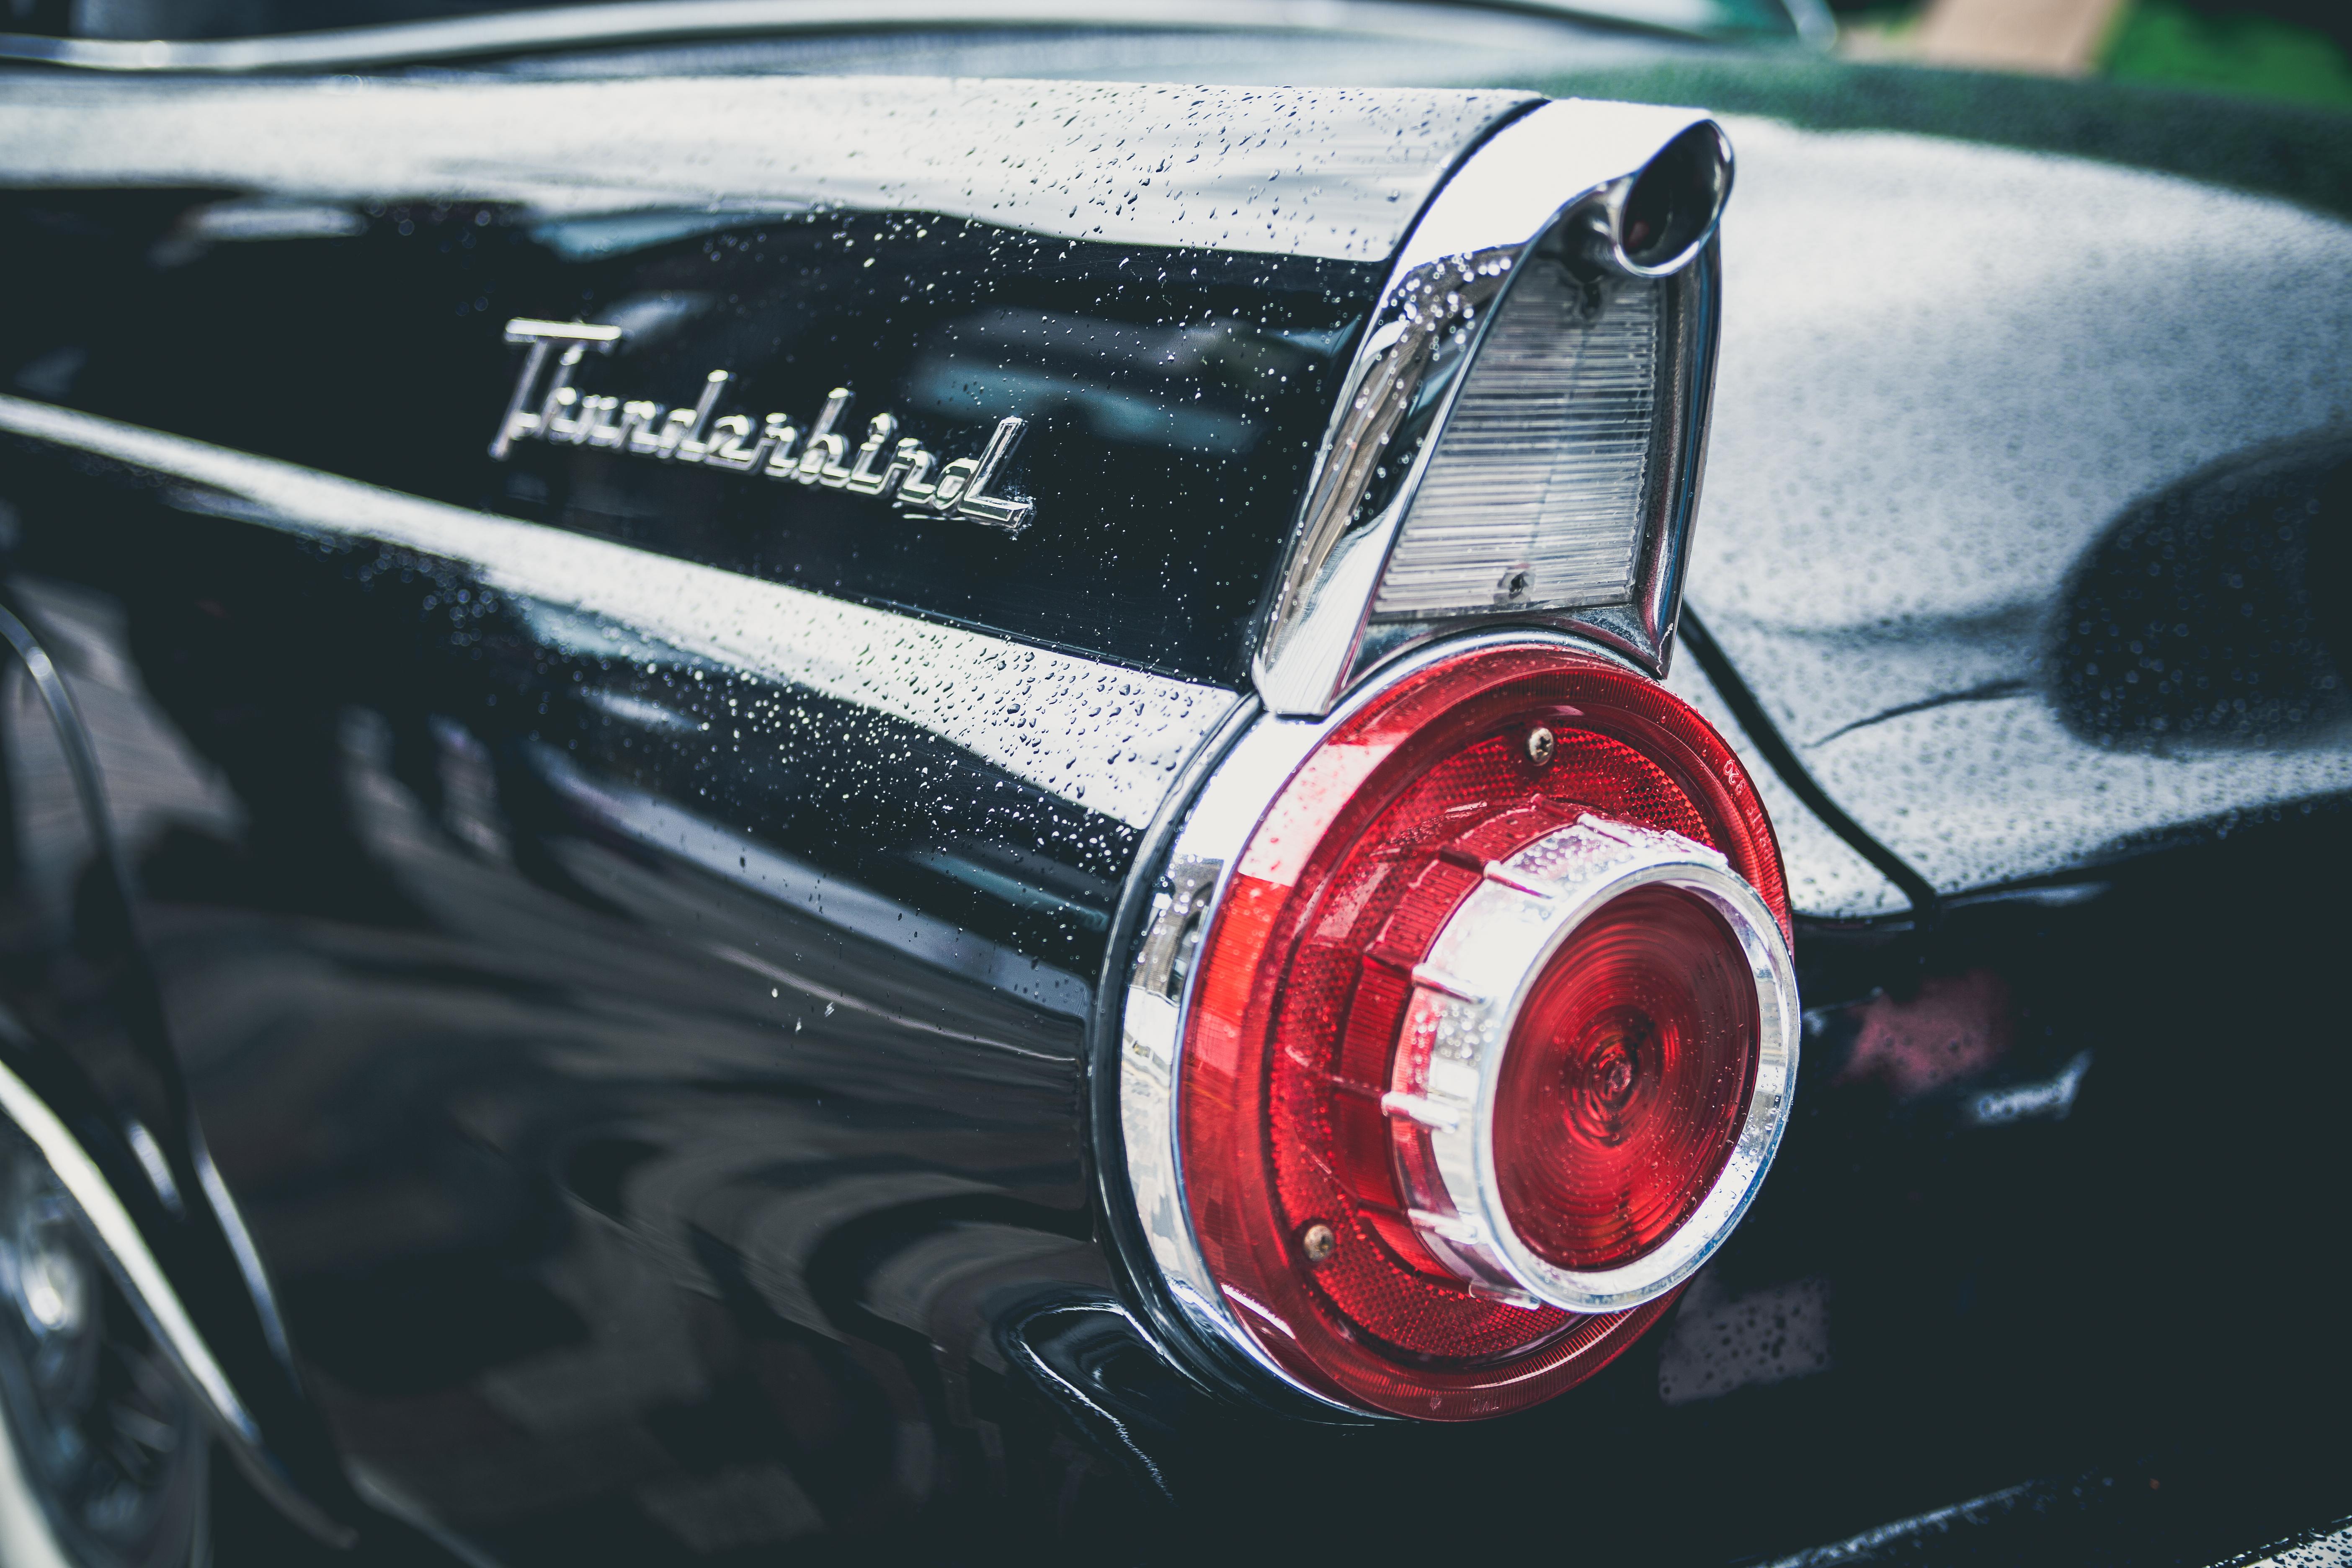 Free Images : vintage, wheel, retro, reflection, emblem, sports car ...